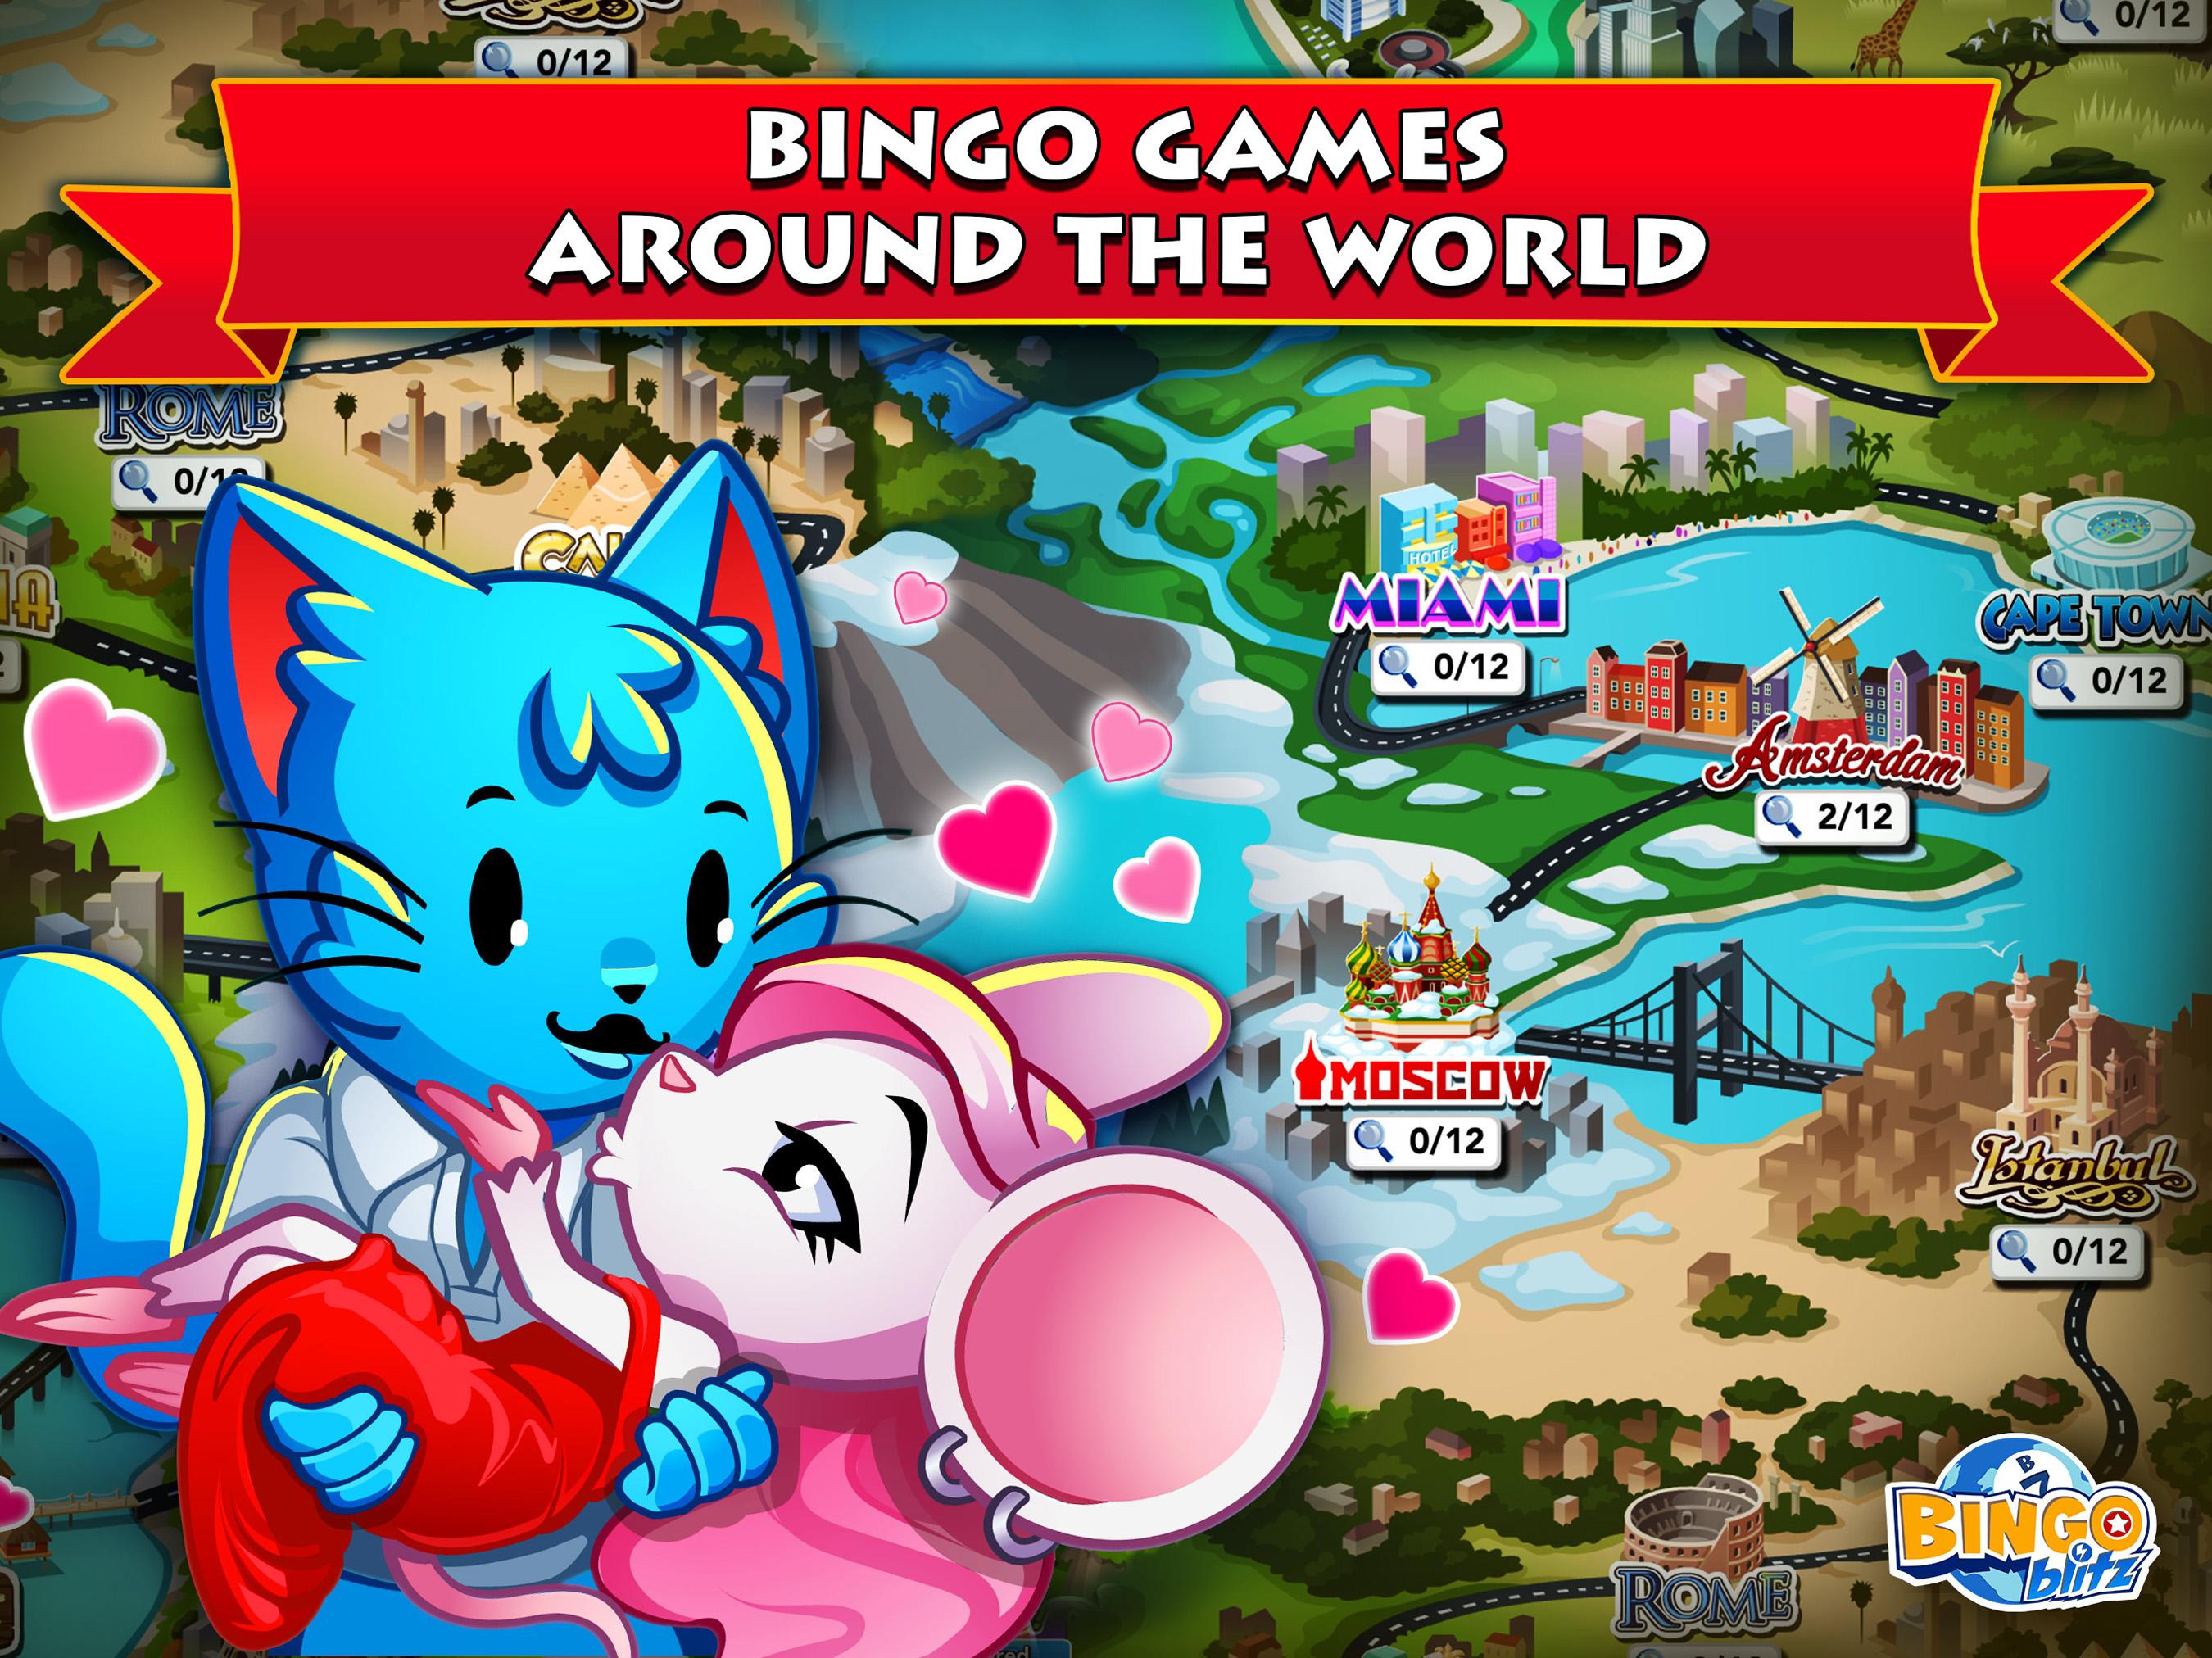 Round-the-World Bingo Party!